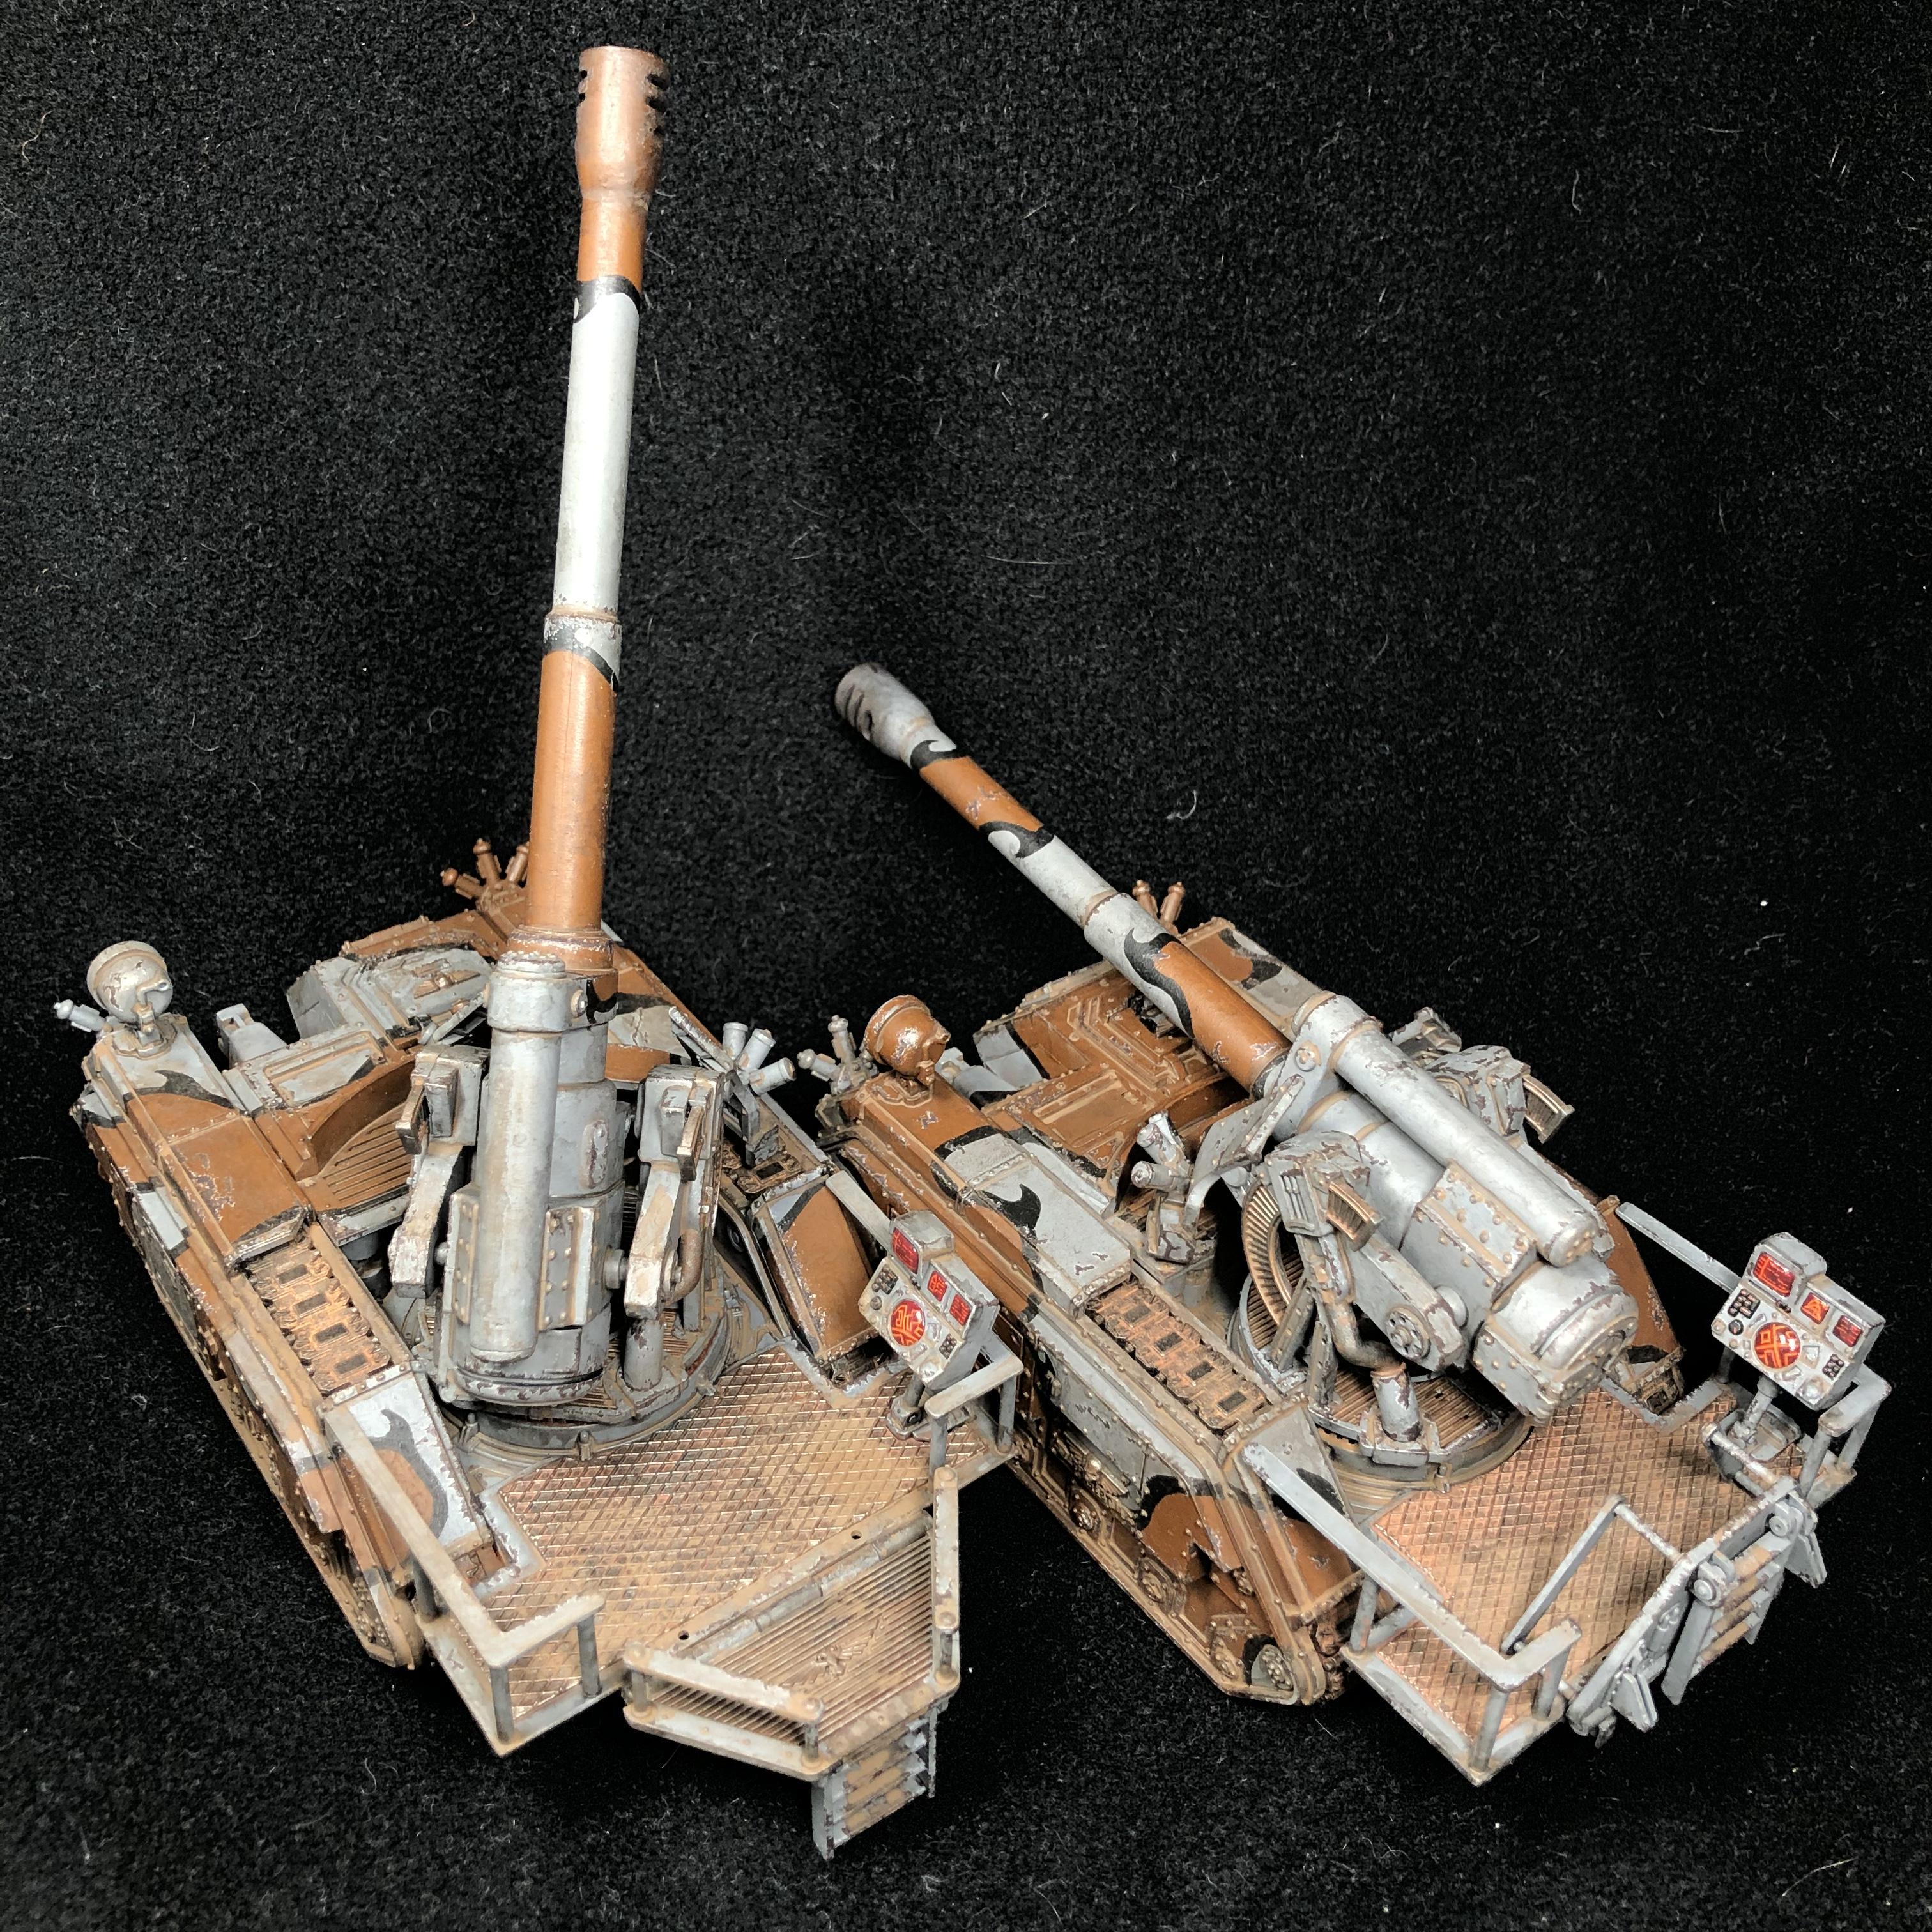 Artillery, Astra Militarum, Basilisk, Cadians, Camouflage, Conversion, Convertion, Earthshaker, Hydra, Imperial Guard, Lenses, Rust, Urban, Warhammer 40,000, Weathered, Wendigo